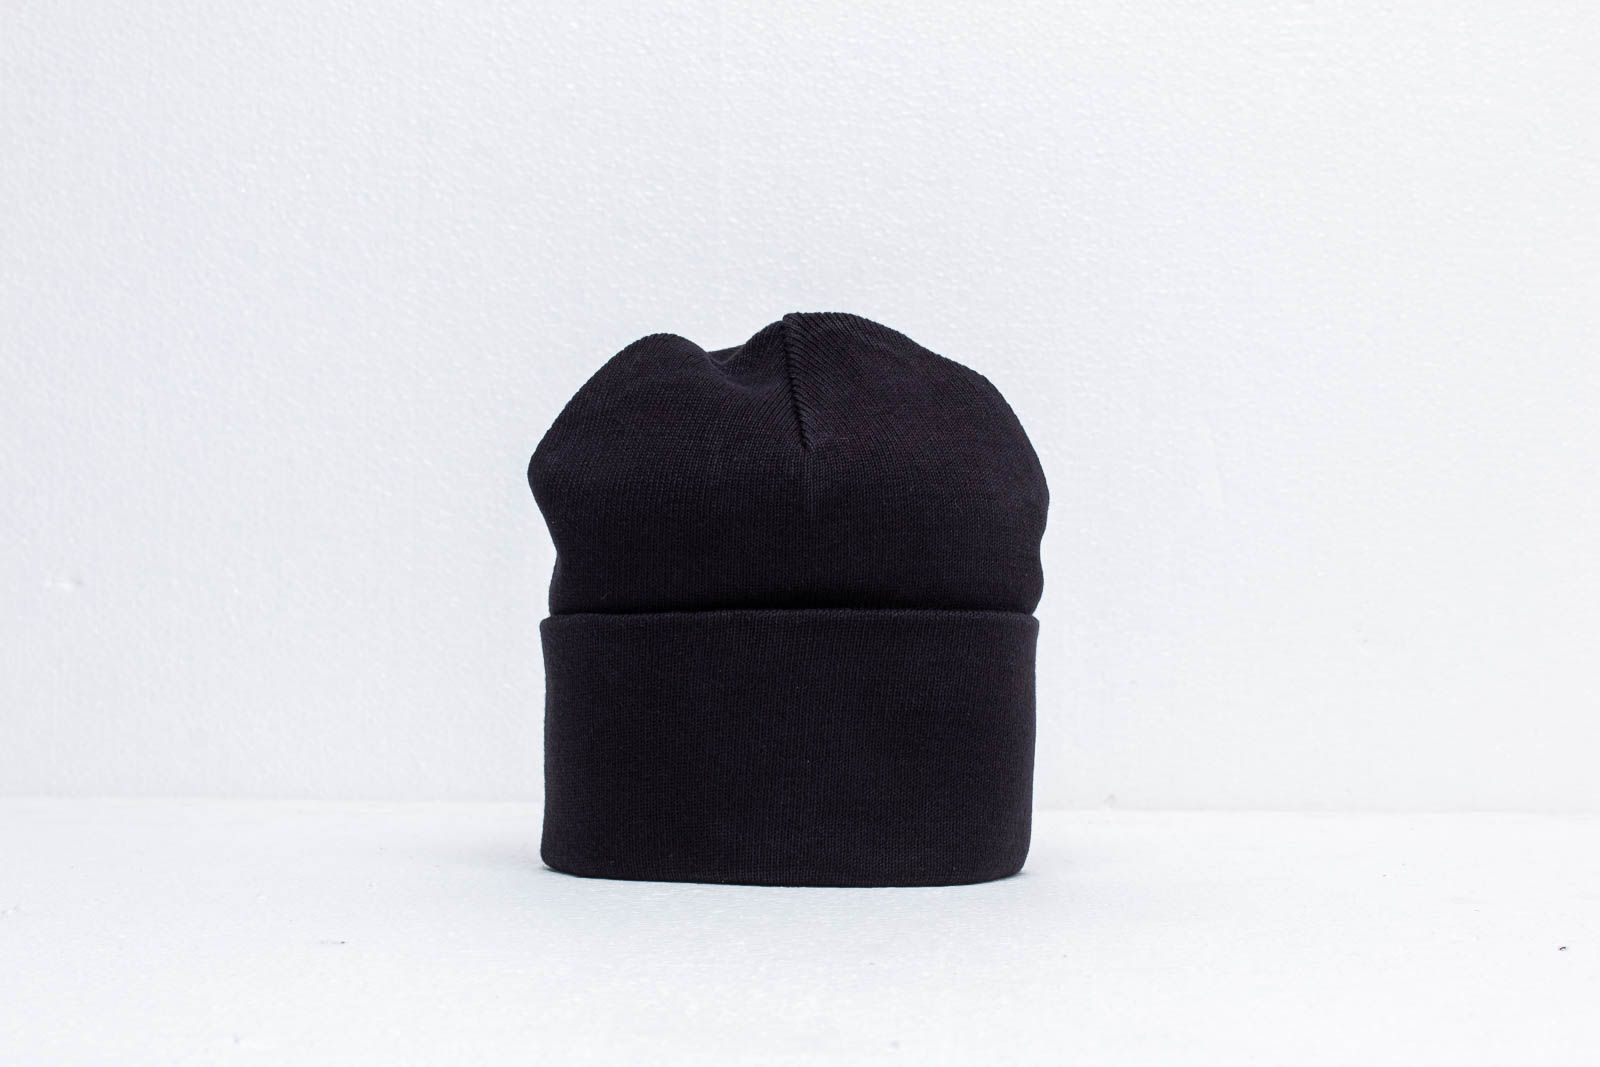 Y-3 Logo Beanie Black at a great price 66 € buy at Footshop 88266a53b6b8